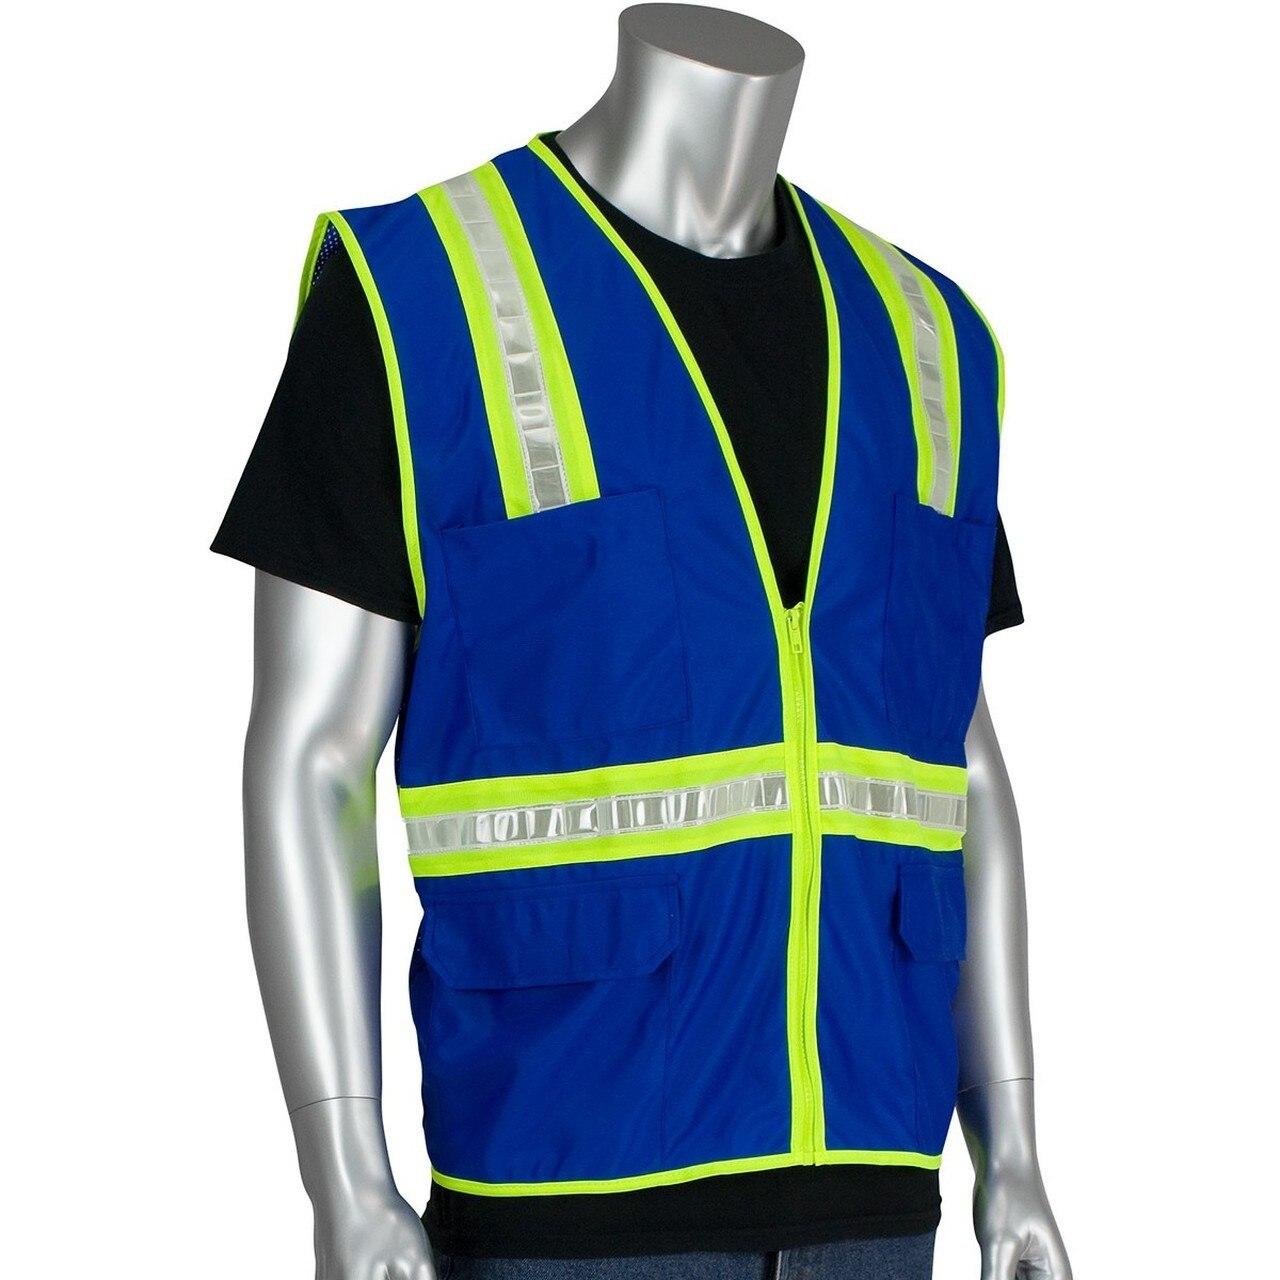 Enhanced Visibility Safety Vests